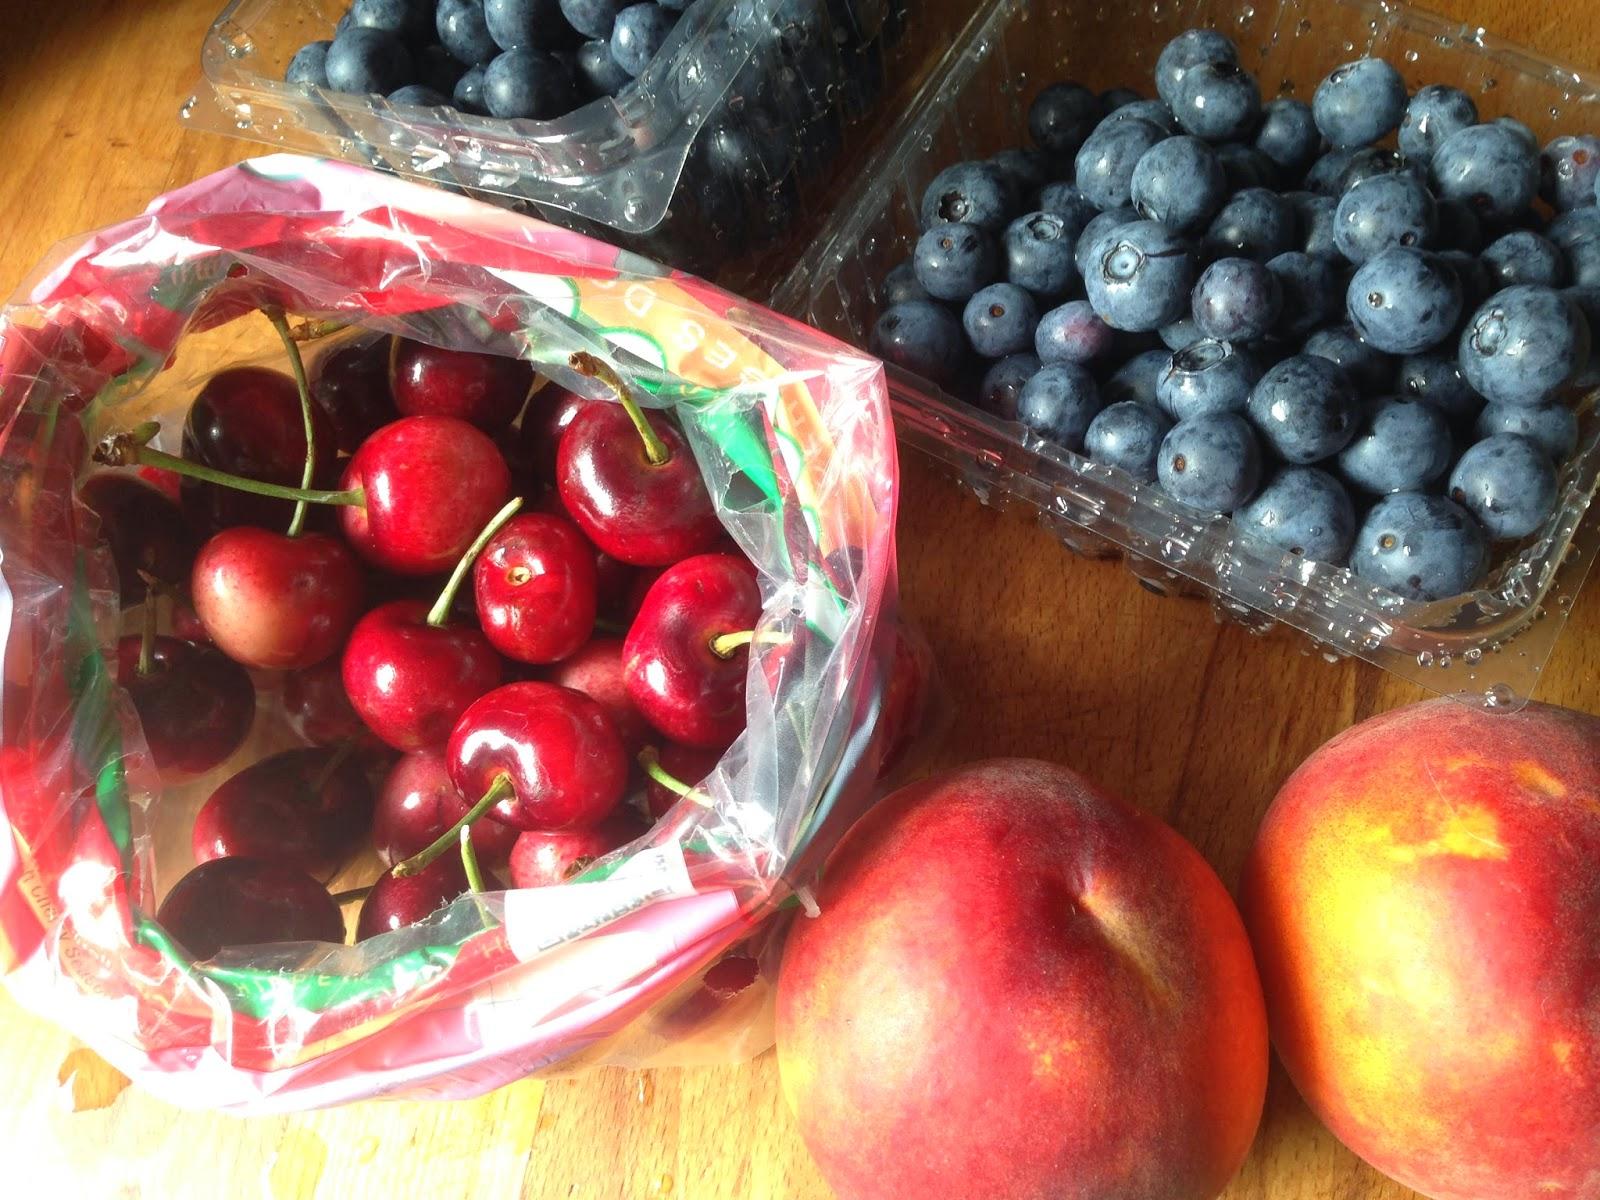 blueberries, cherries, peaches